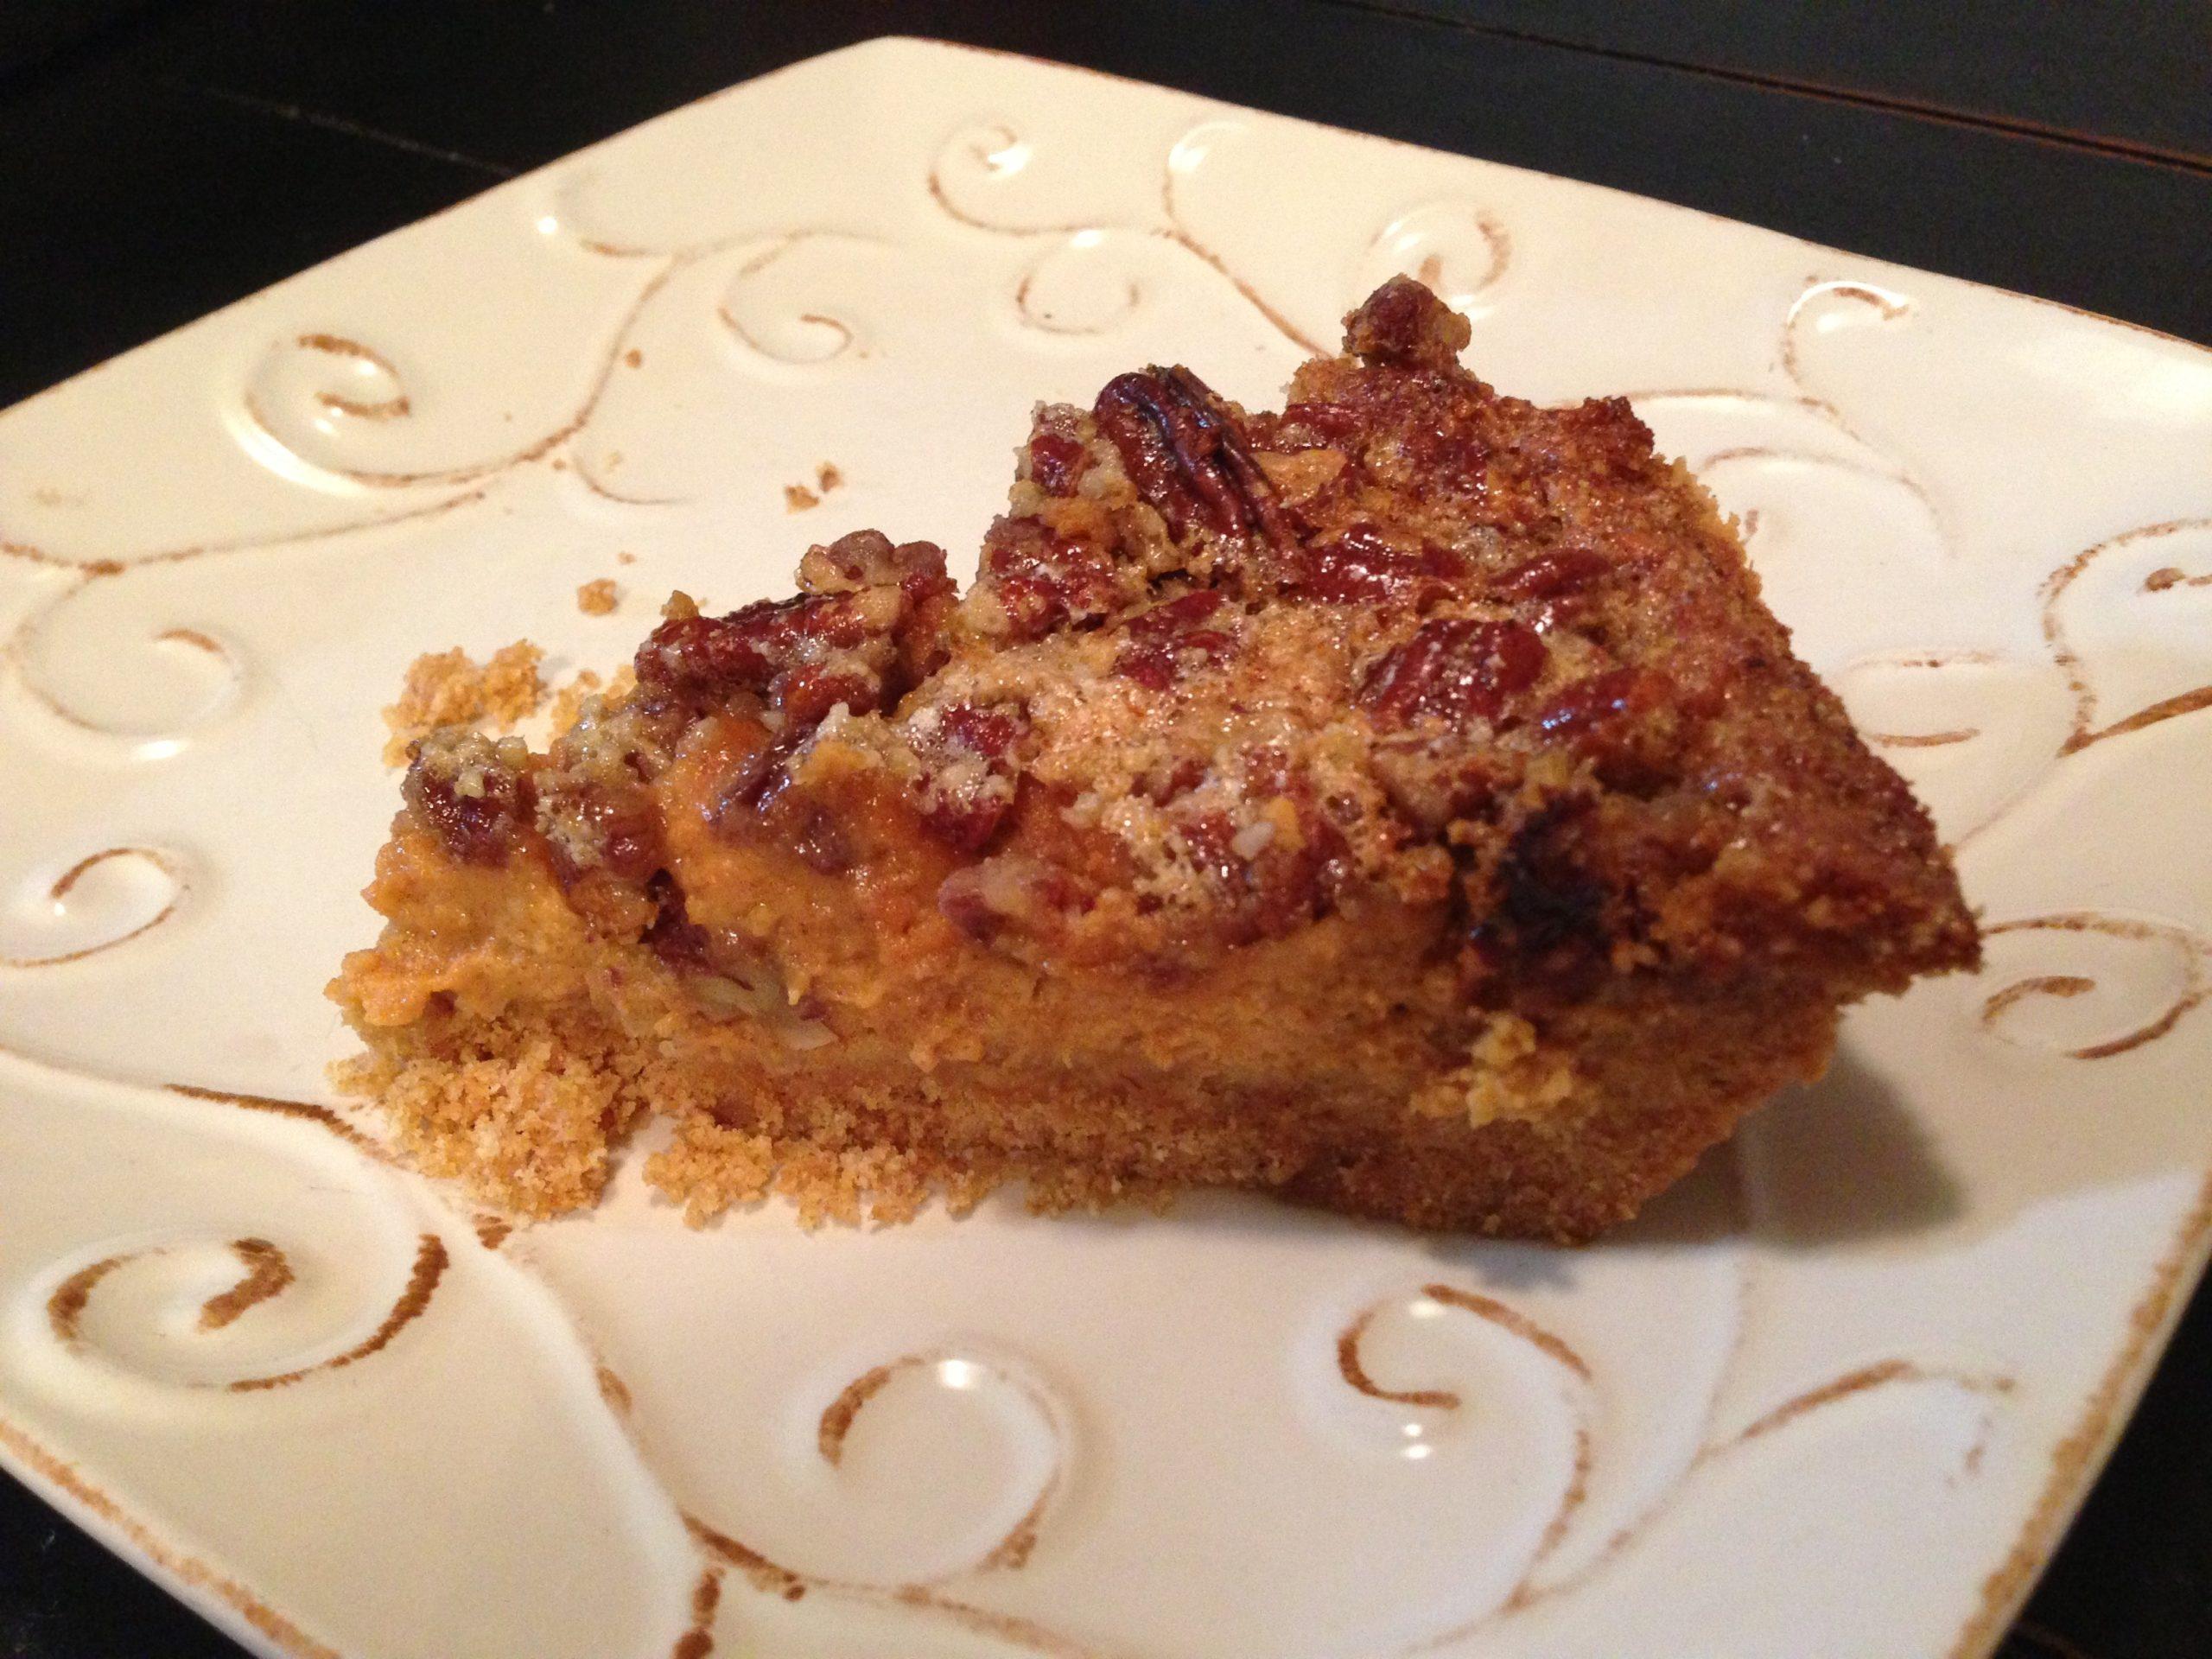 Powell Favorite Pecan Pumpkin Cheesecake - Get the recipe at https://heidipowell.net/3688